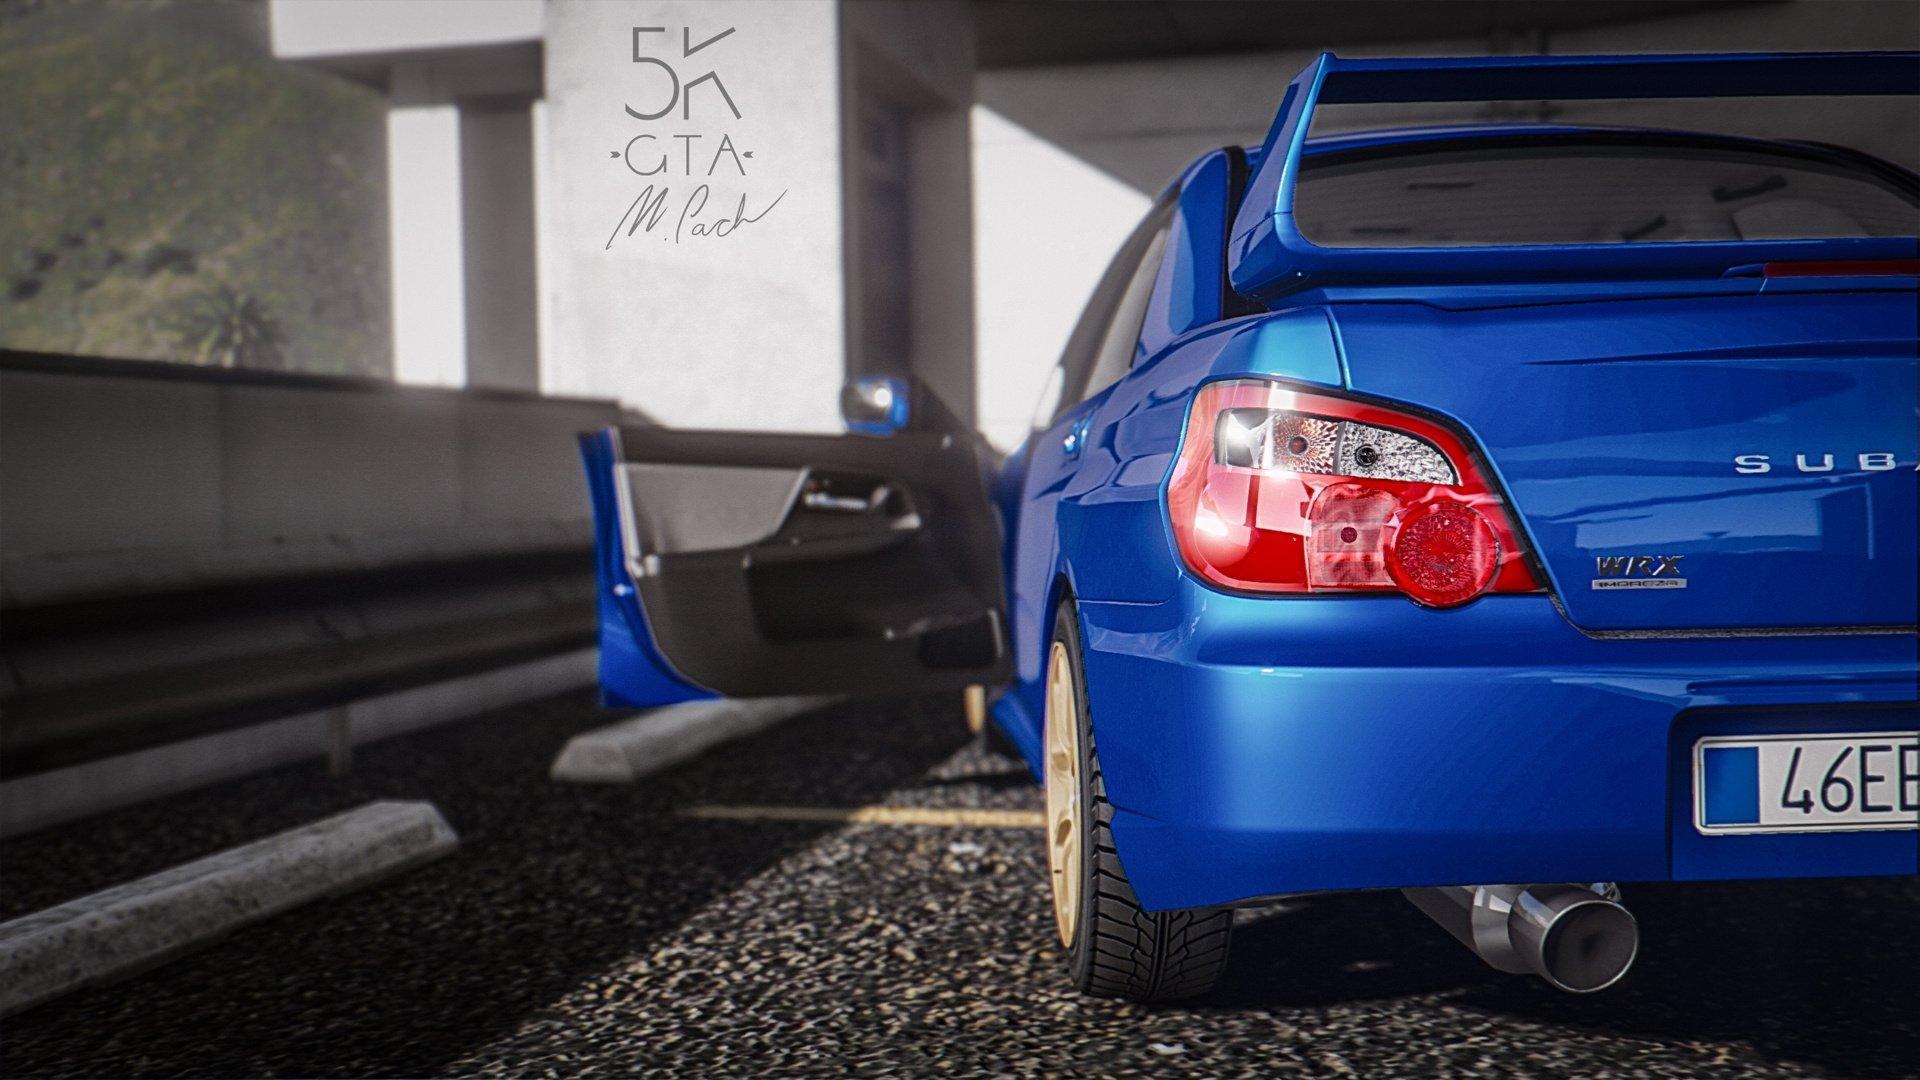 Subaru impreza wrx sti 2004 add on tuning gta5 mods 569d90 balksz 3 altavistaventures Gallery